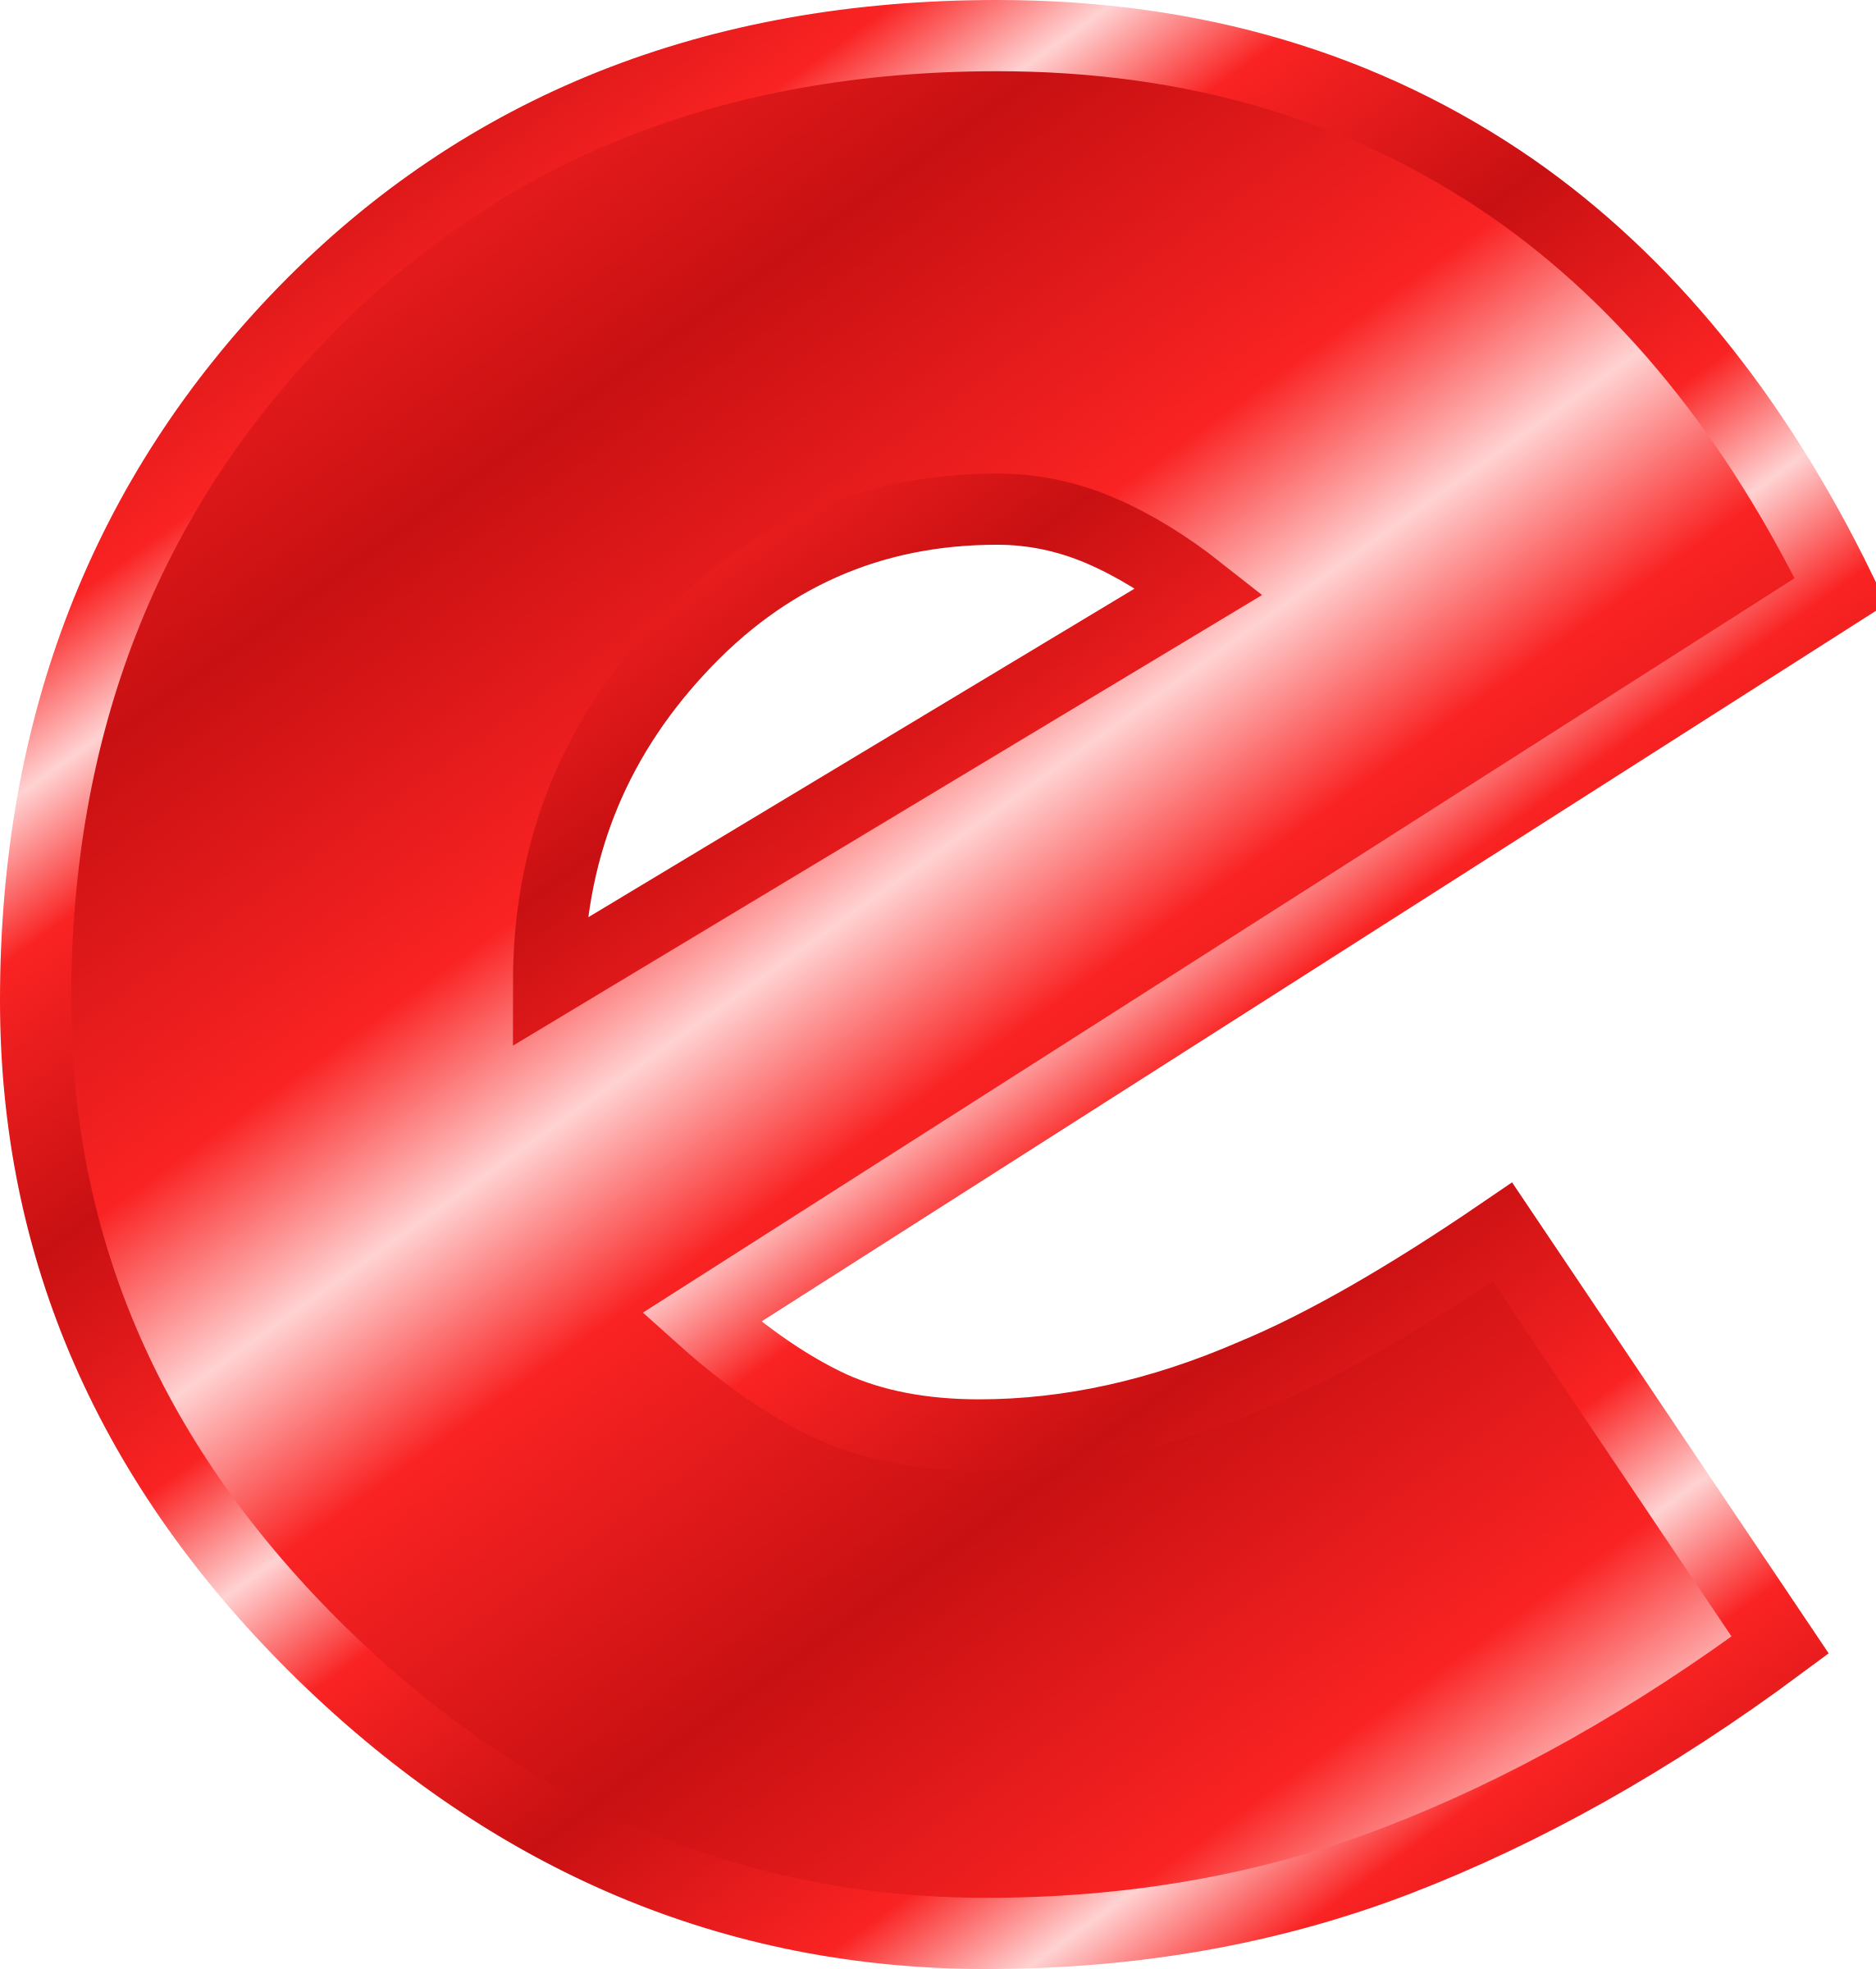 E clipart little, E little Transparent FREE for download on.